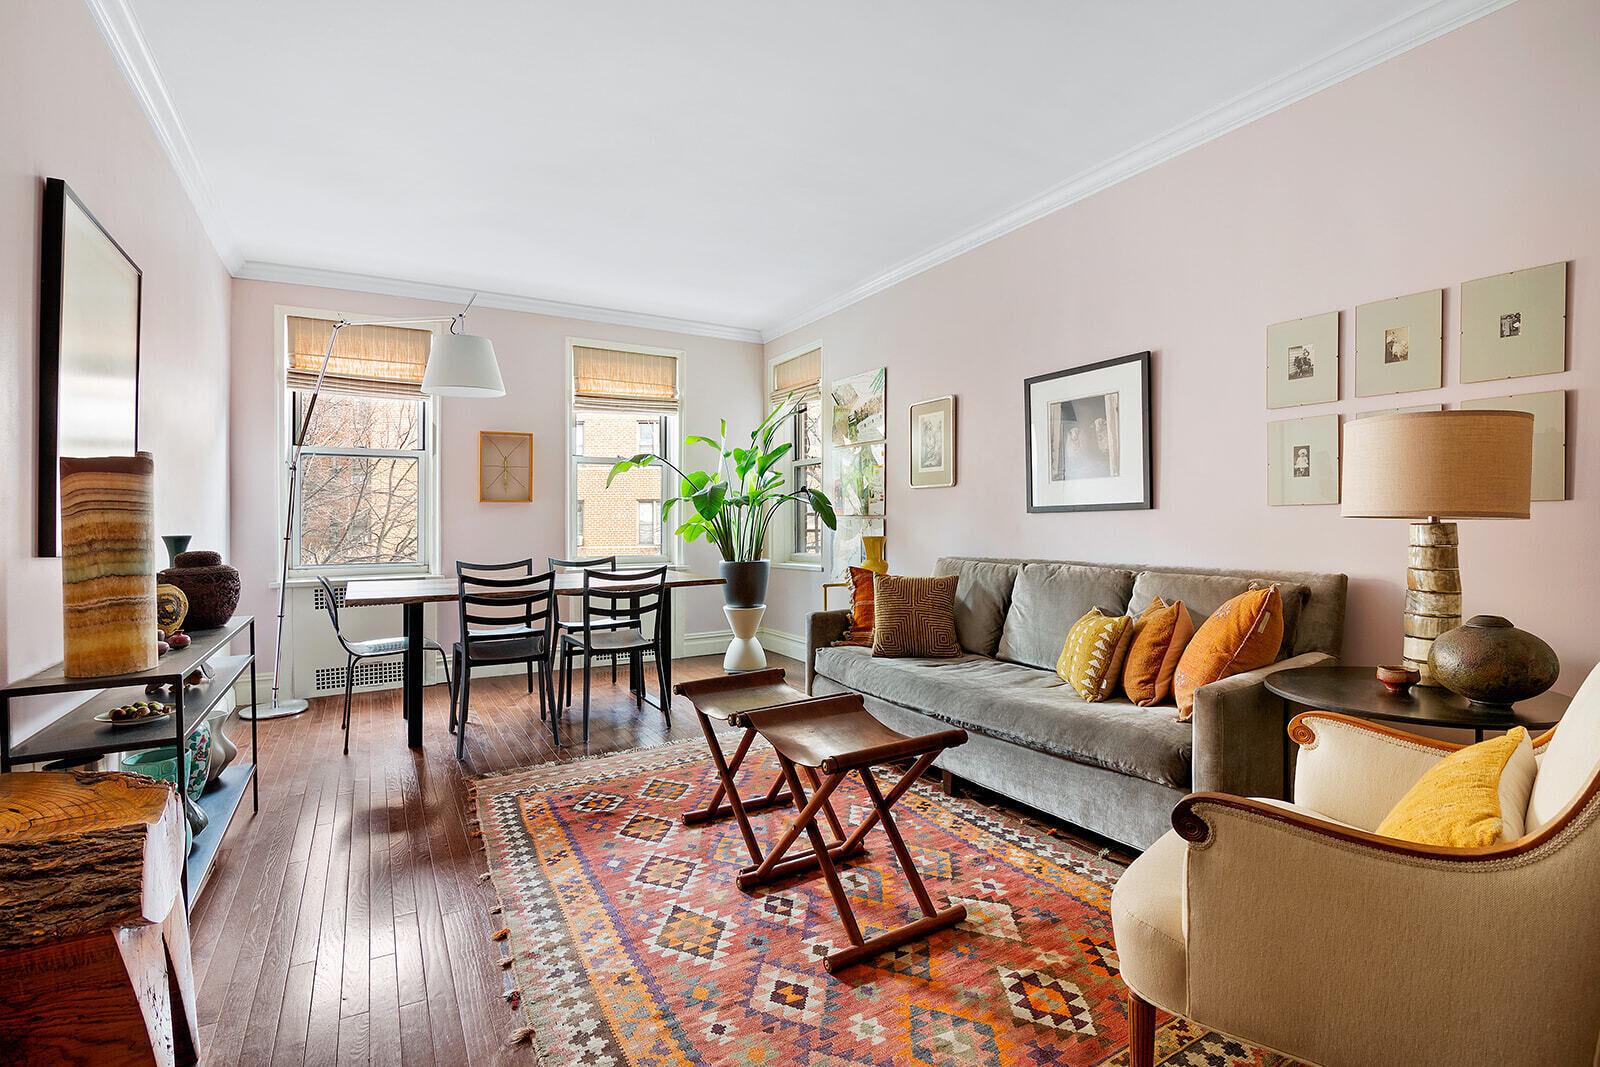 Apartment for sale at 73-12 35th Avenue, Apt C-44